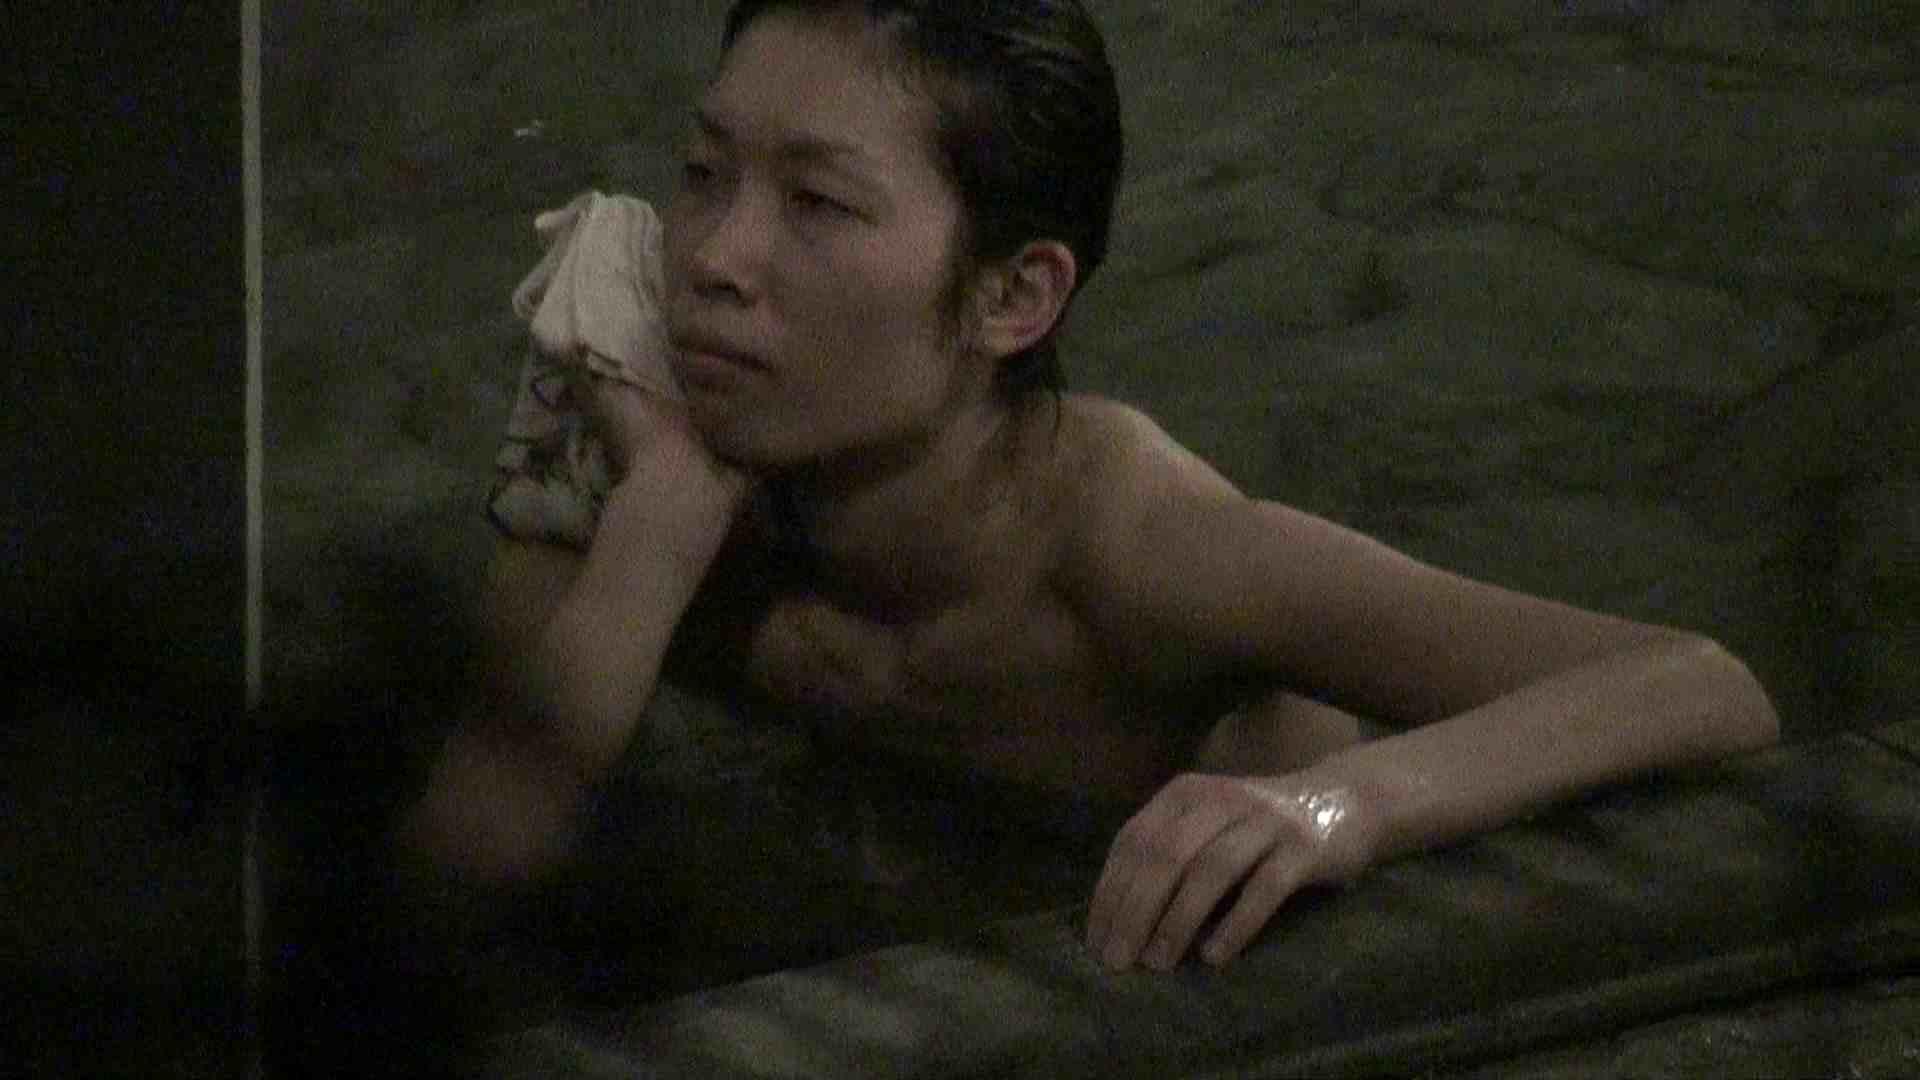 Aquaな露天風呂Vol.399 盗撮シリーズ | 露天風呂編  85PIX 13